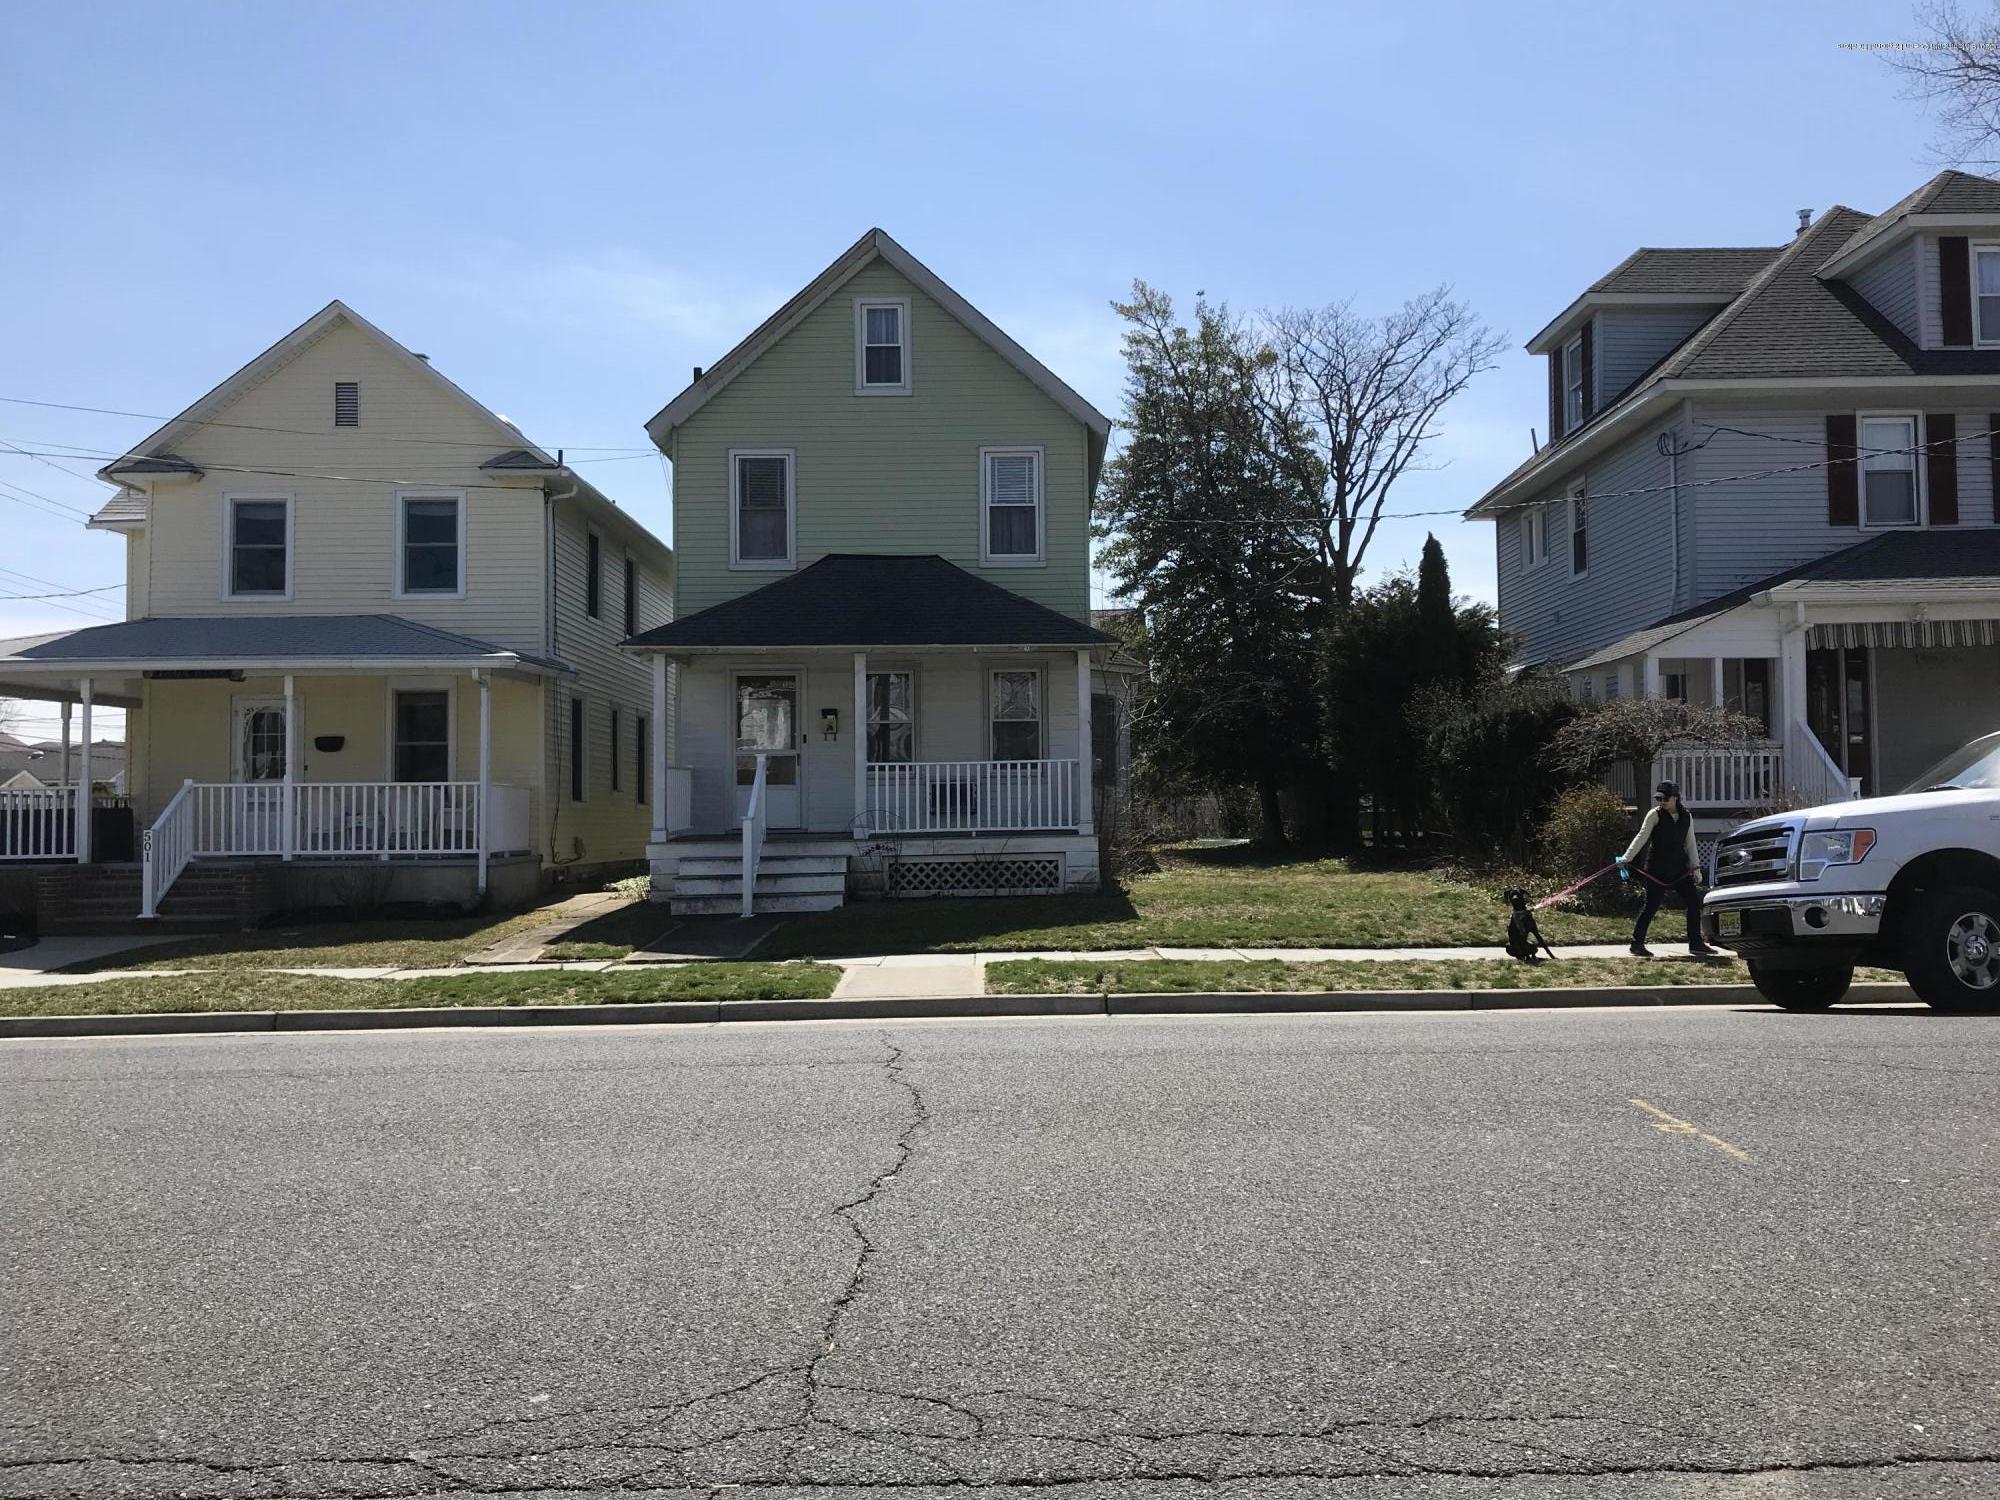 503 Woodland Avenue Avon-by-the-sea NJ 07717